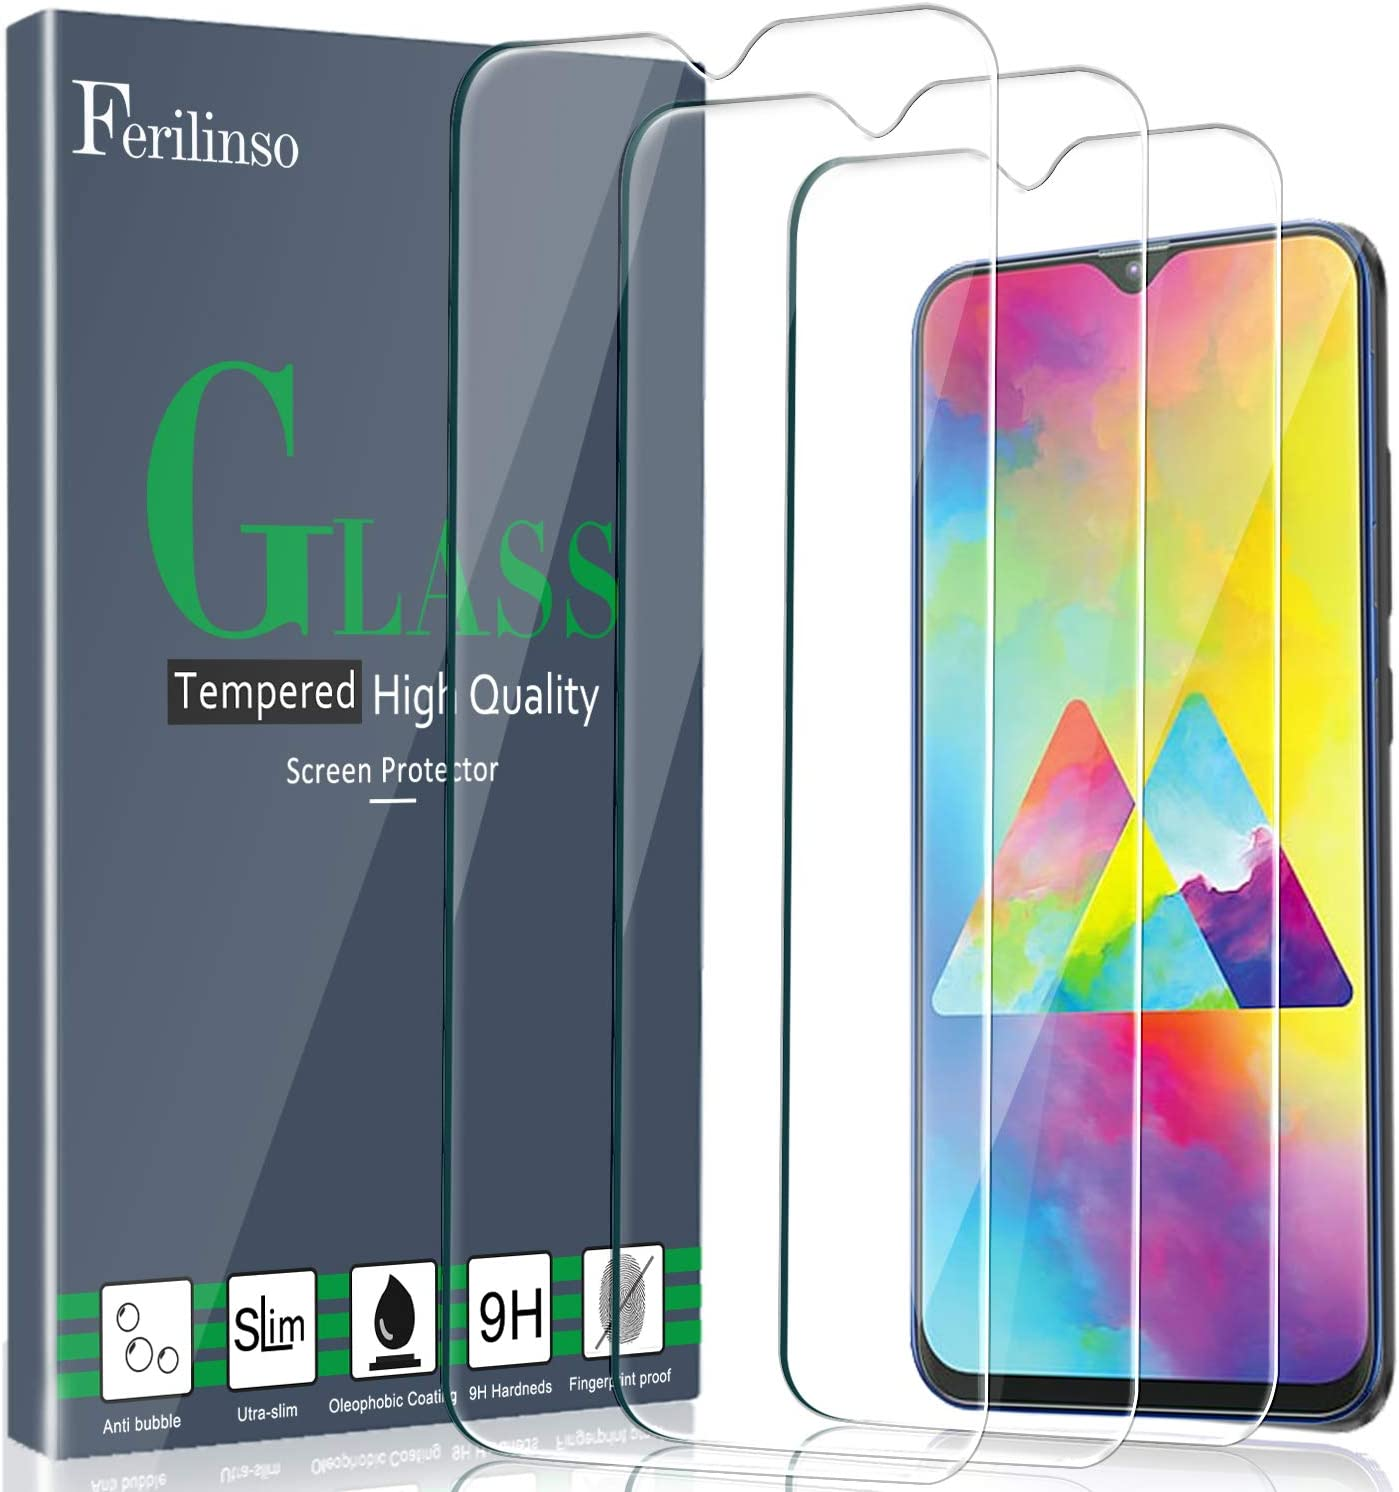 Ferilinso Cristal Templado para Samsung Galaxy M20, A10S, A10 Cristal Templado, [3 Pack] Protector de Pantalla Screen Protector: Amazon.es: Electrónica